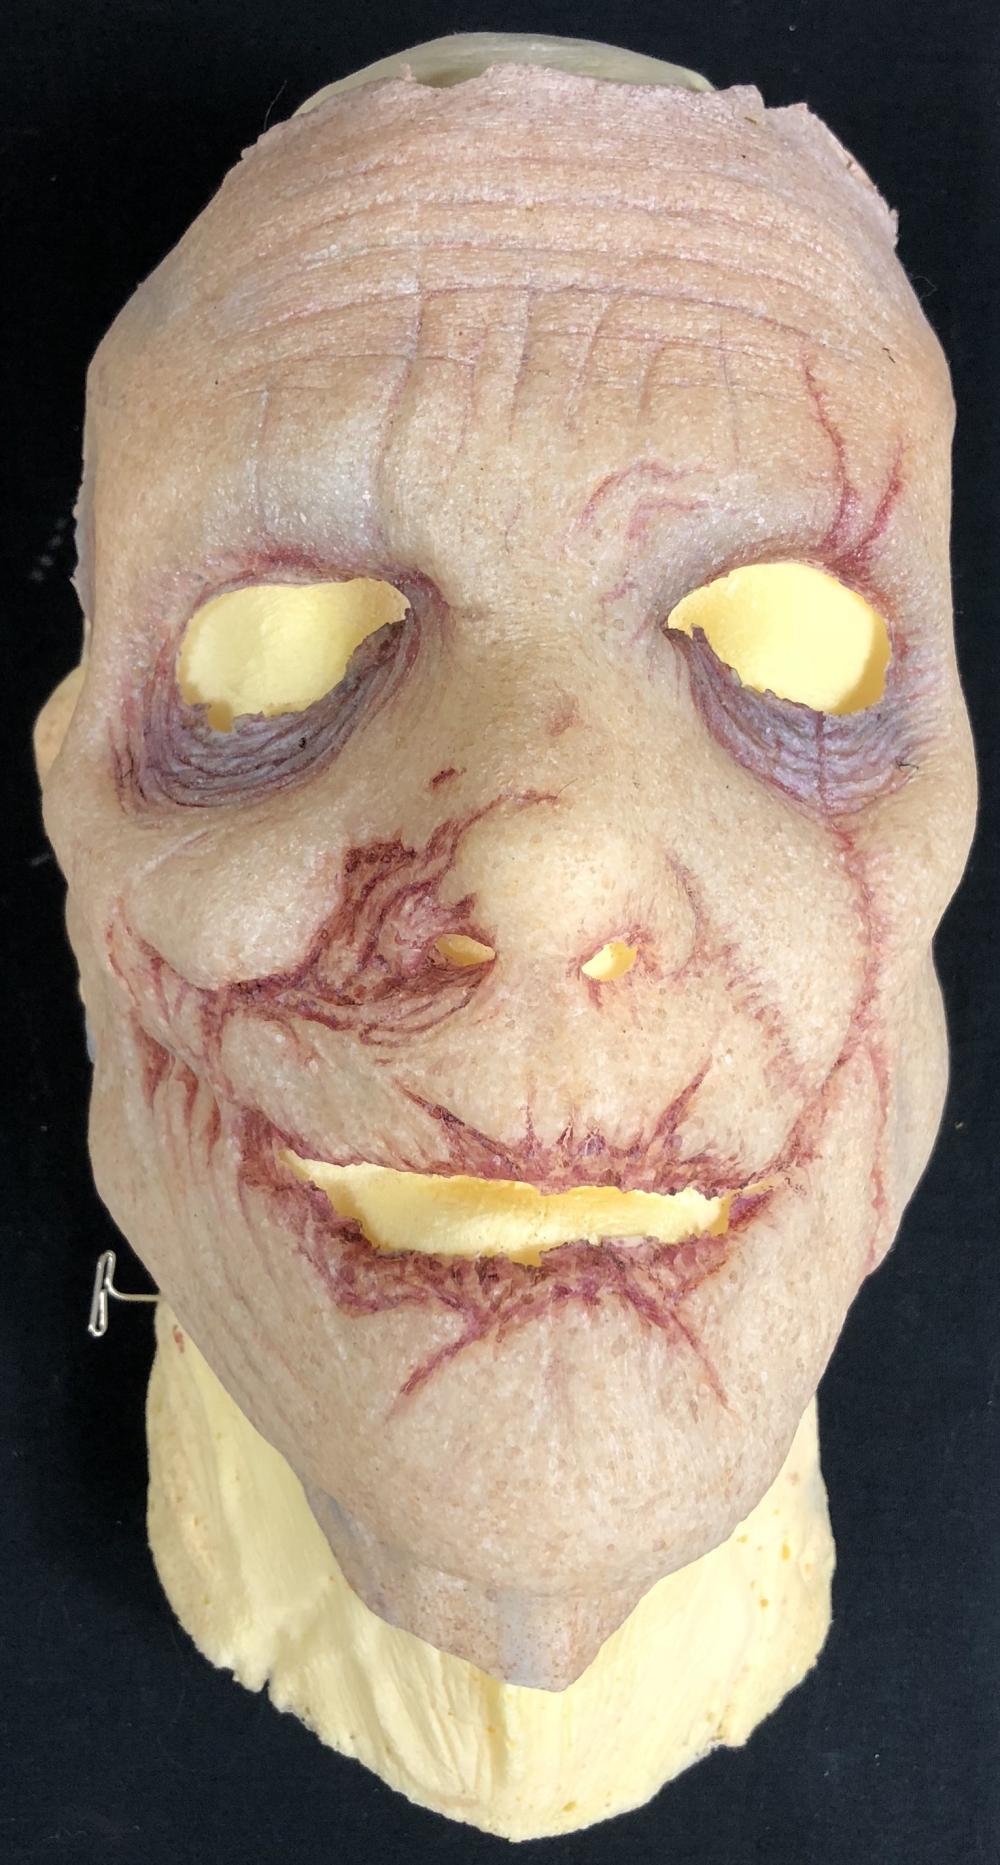 Lot 48: The ByeBye Man (2017) - Doug Jones Screen Used Silicone Mask & Life Cast Bust